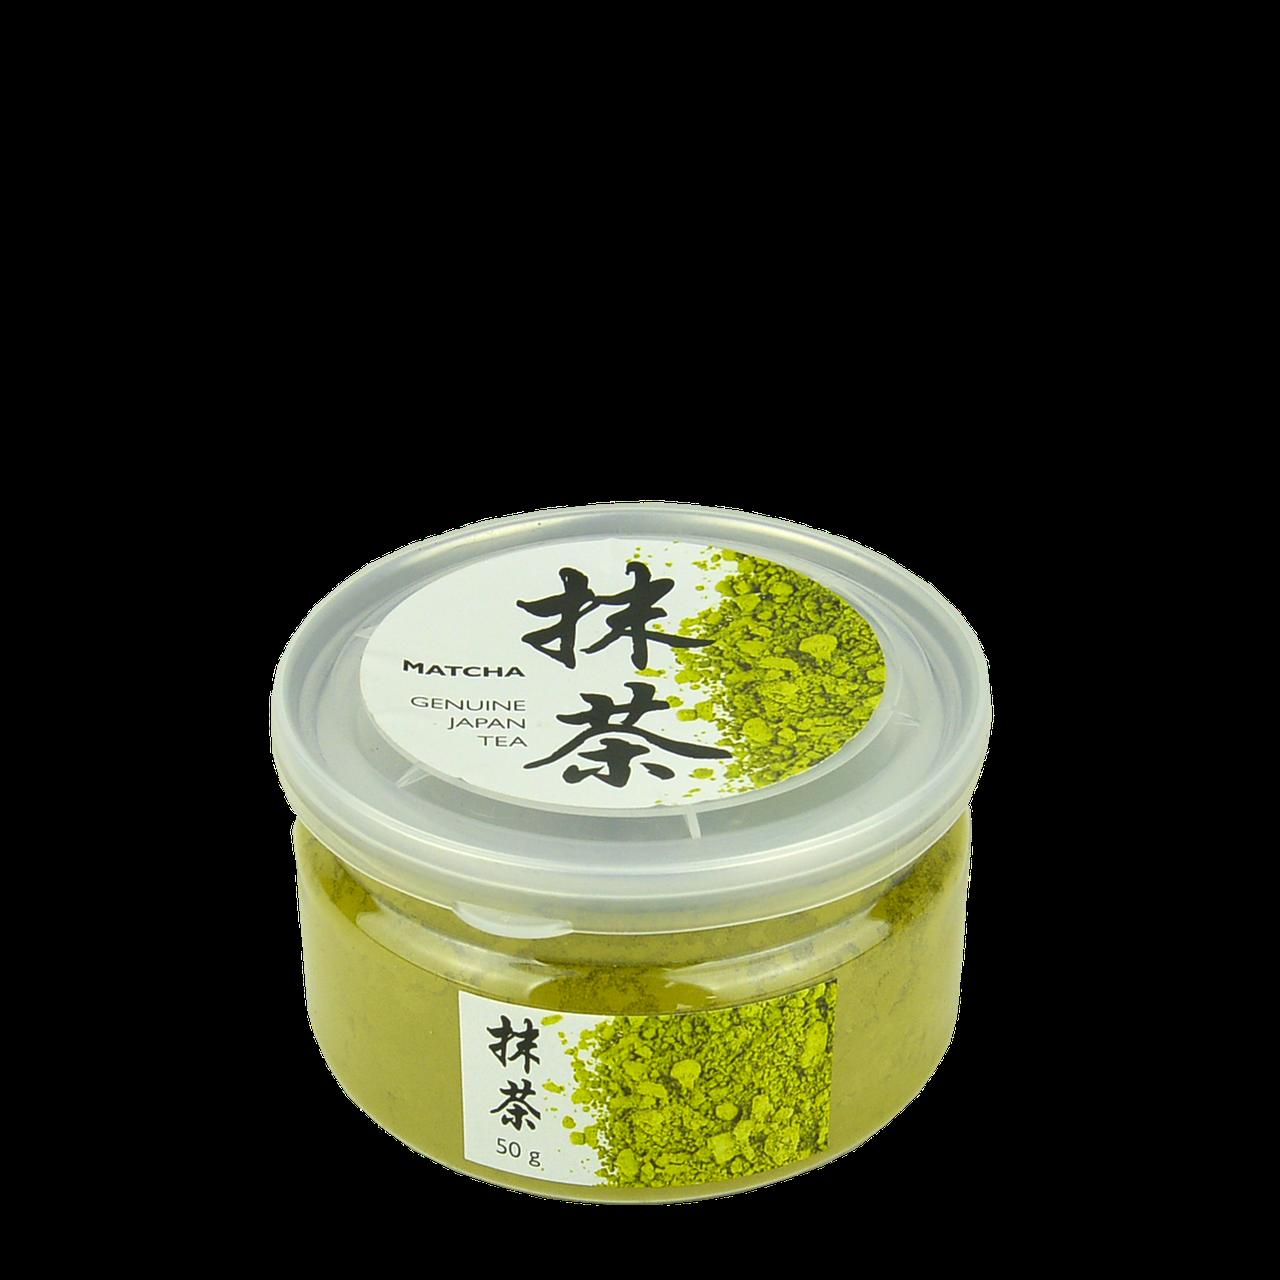 заказать чай от https://petrovka-horeca.com.ua/